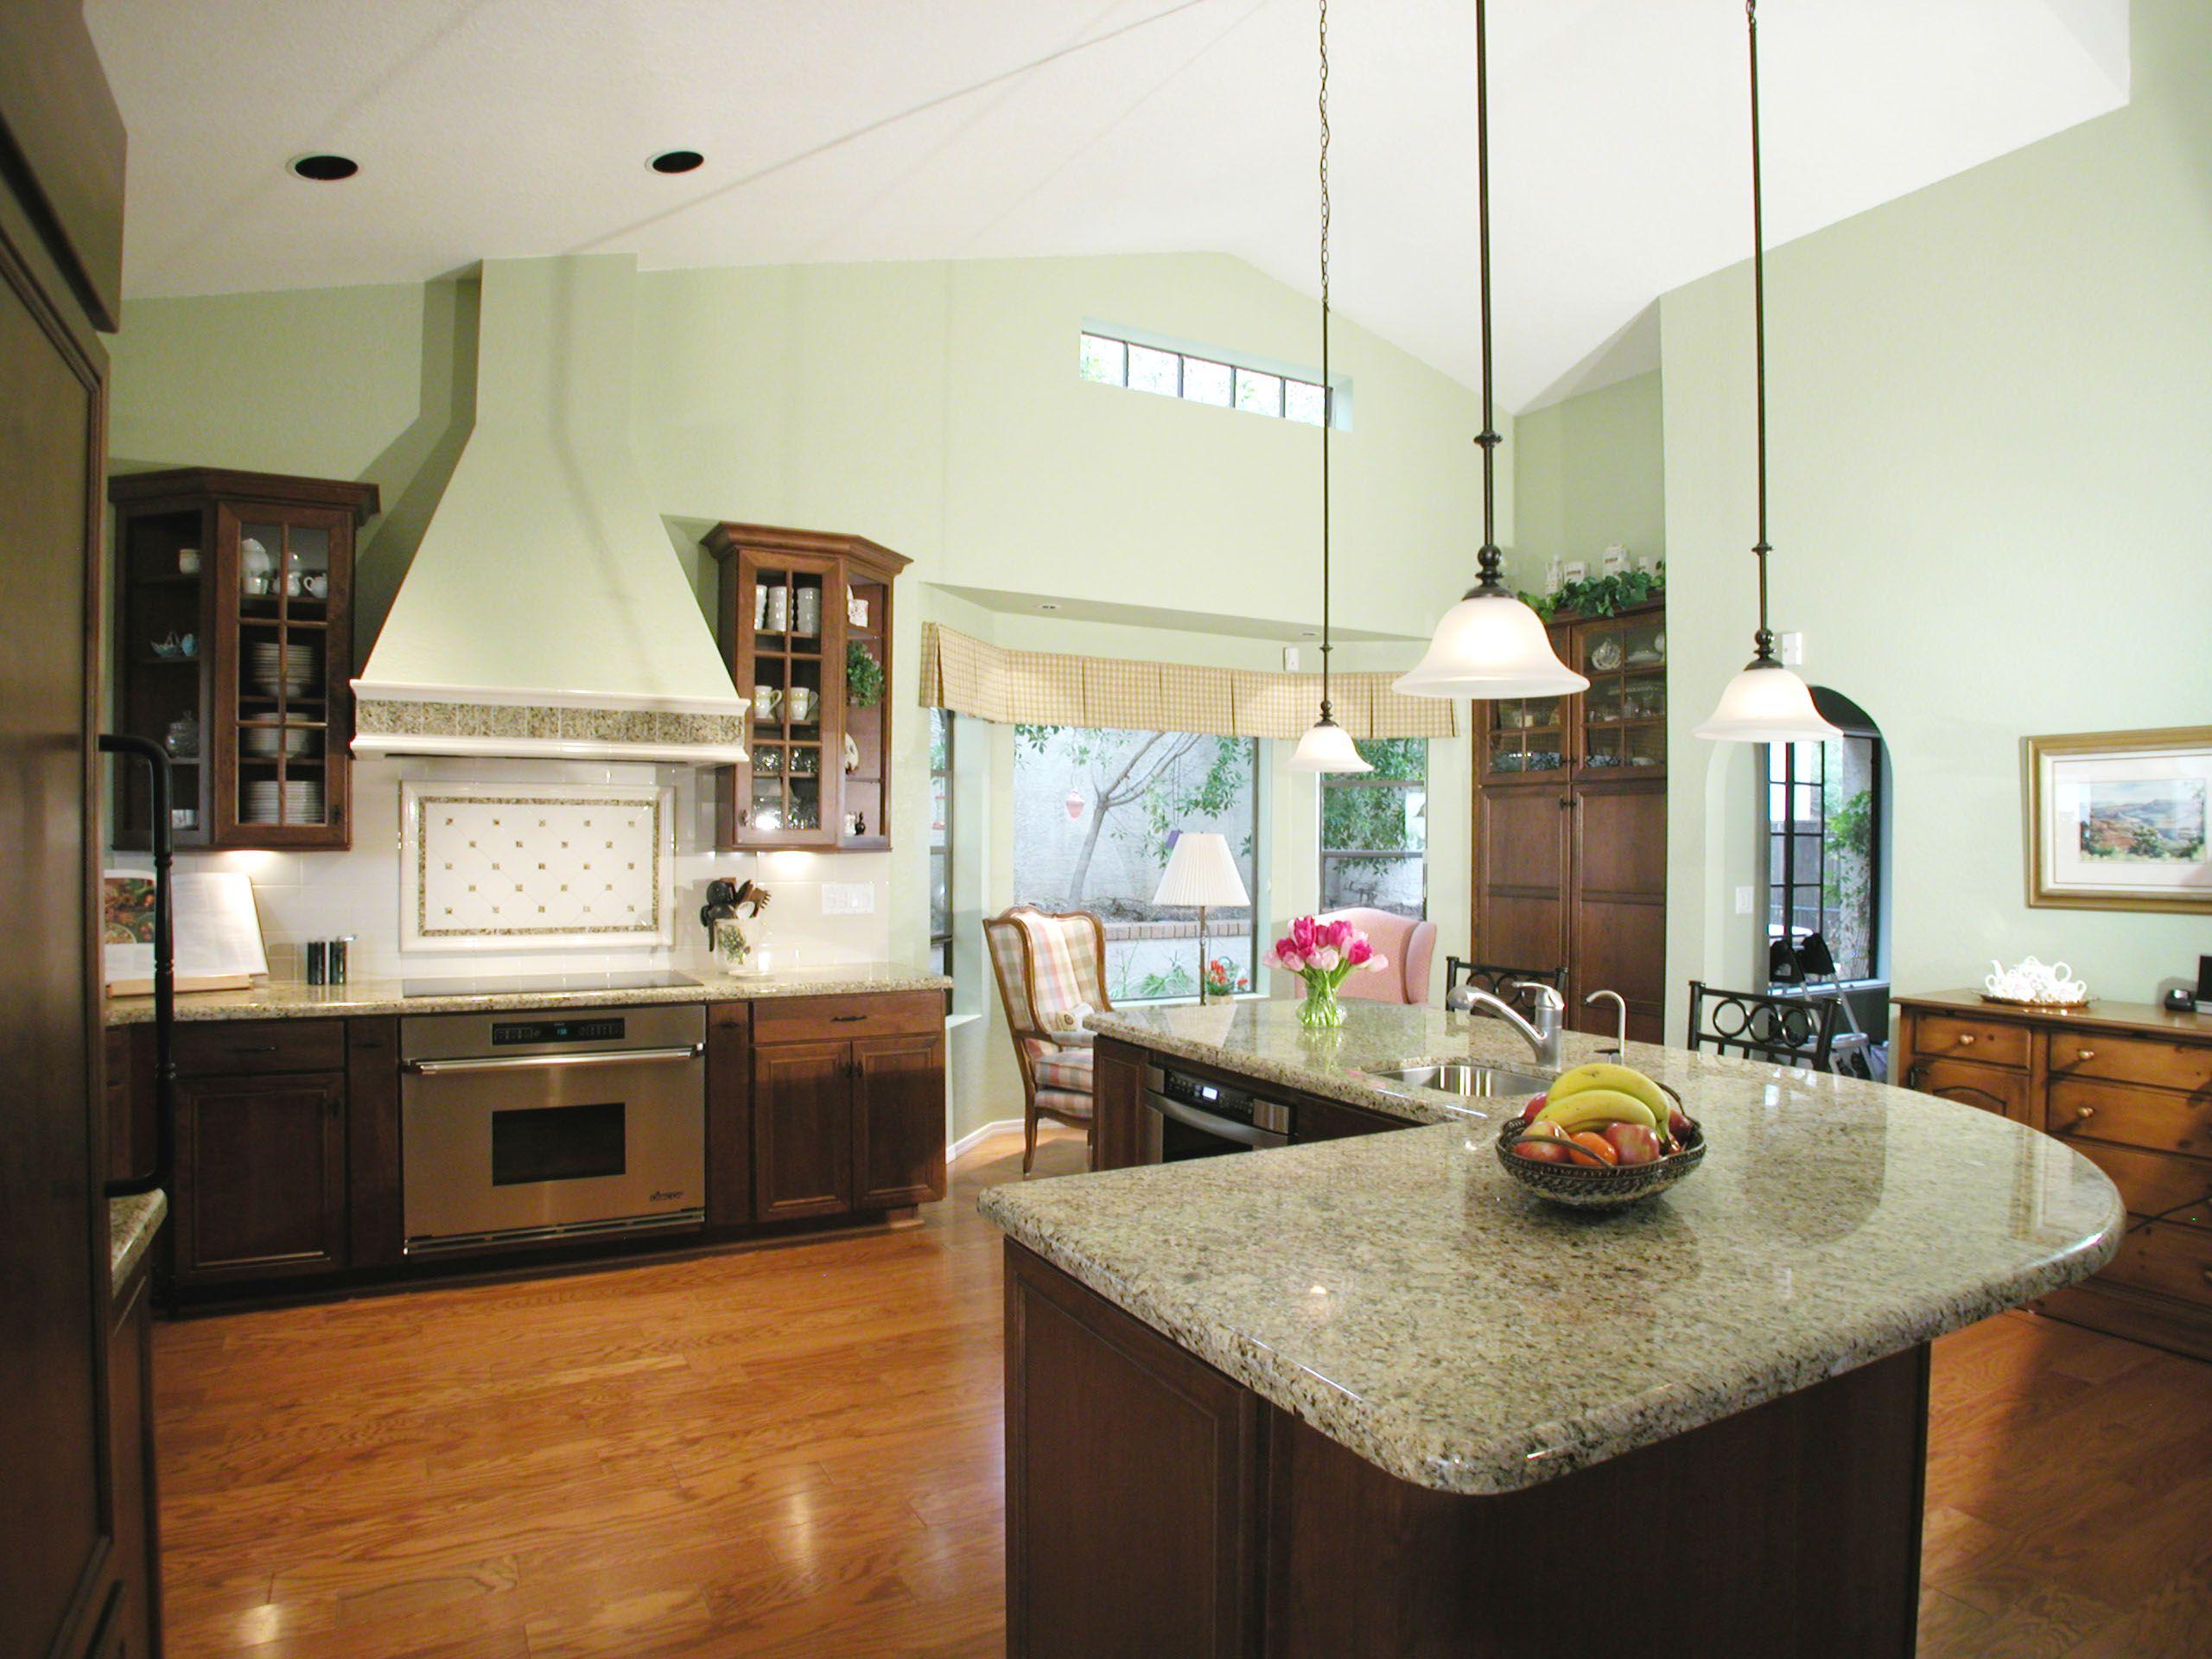 luxury kitchen island l shape design with cream granite countertop